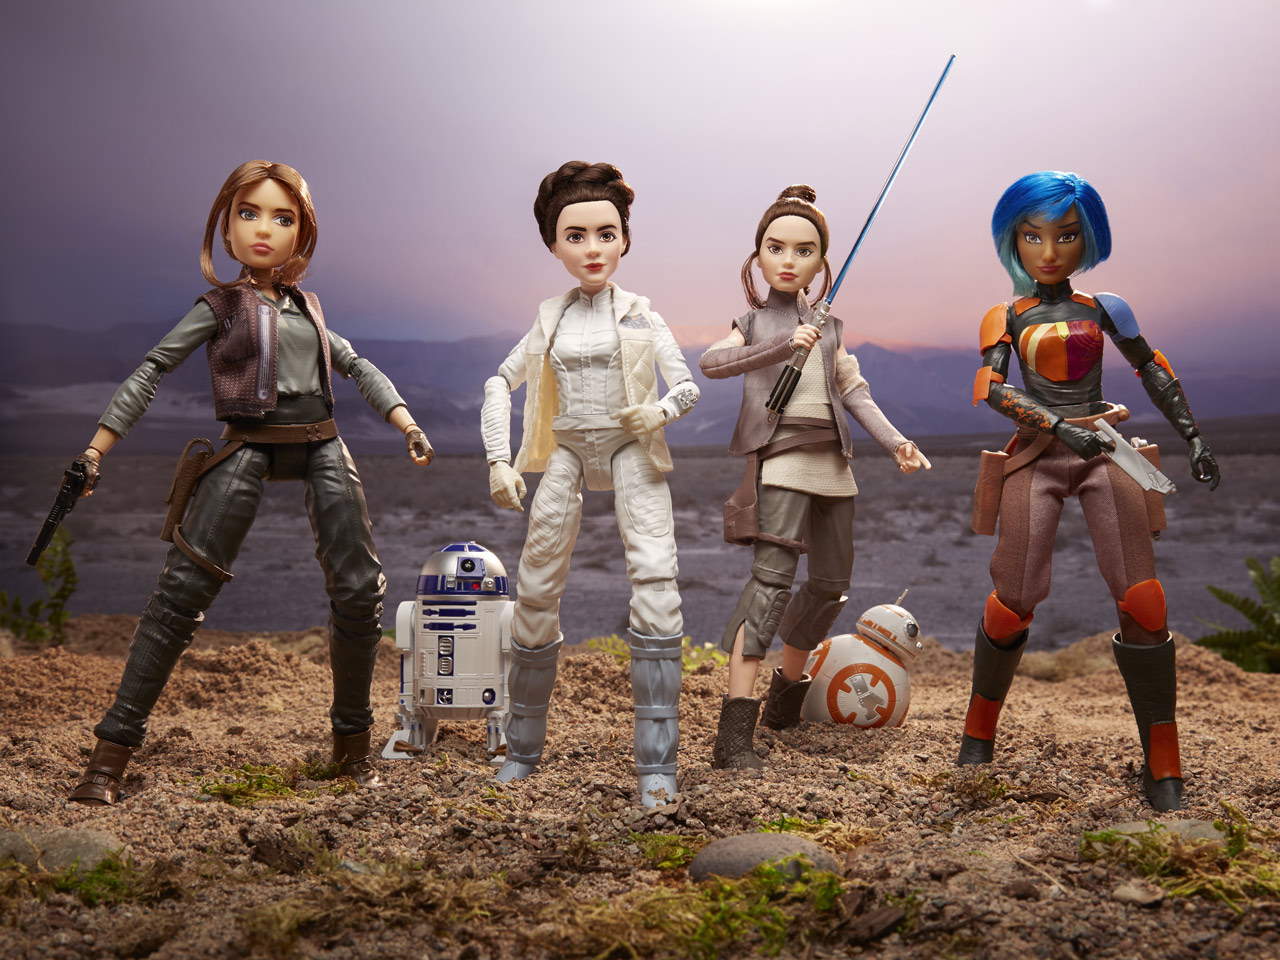 Primer tráiler de Star Wars: The Last Jedi ha sido revelado